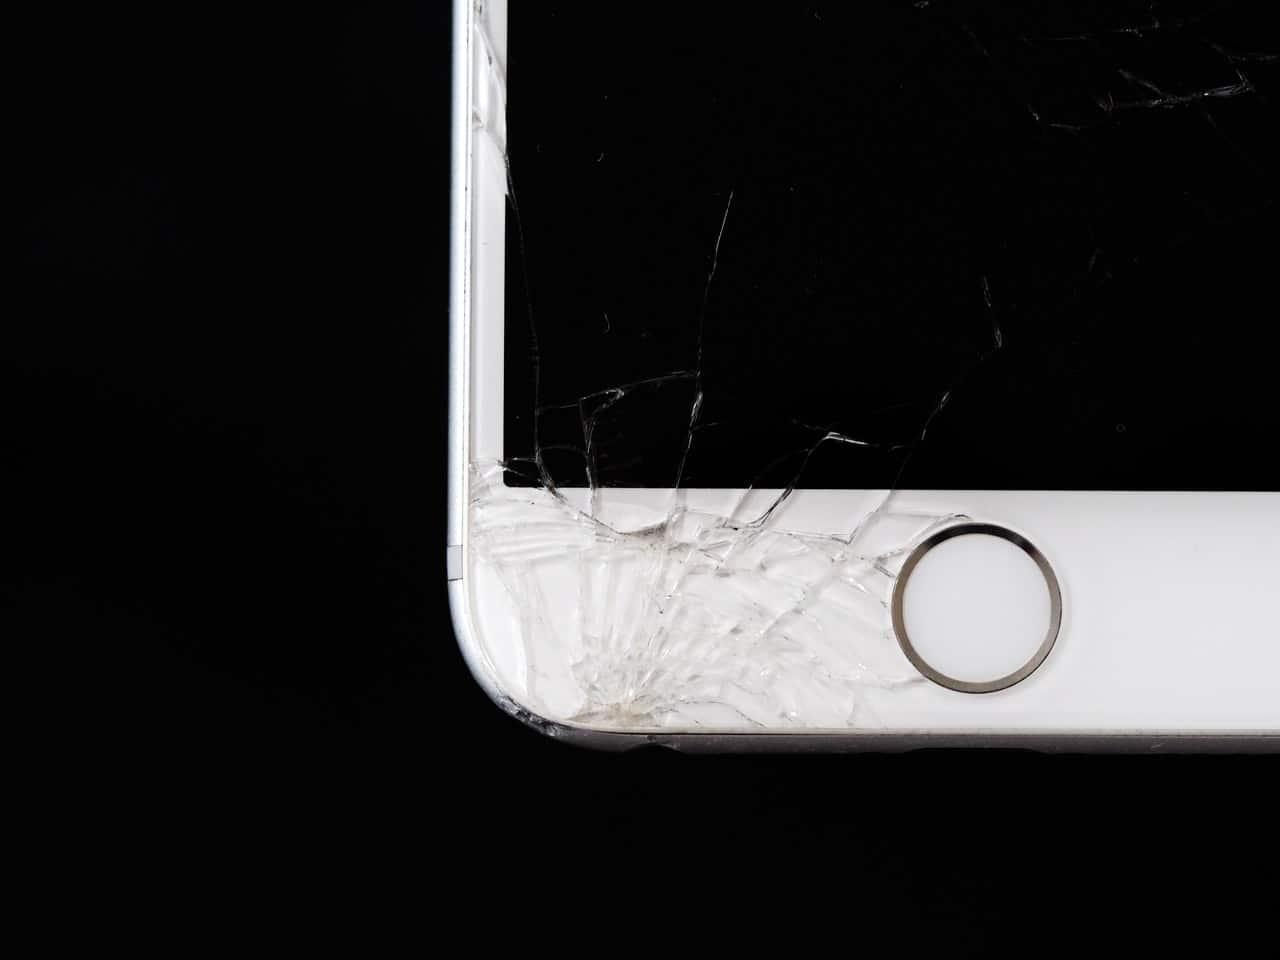 Unfixable iPhone Damage Article Image